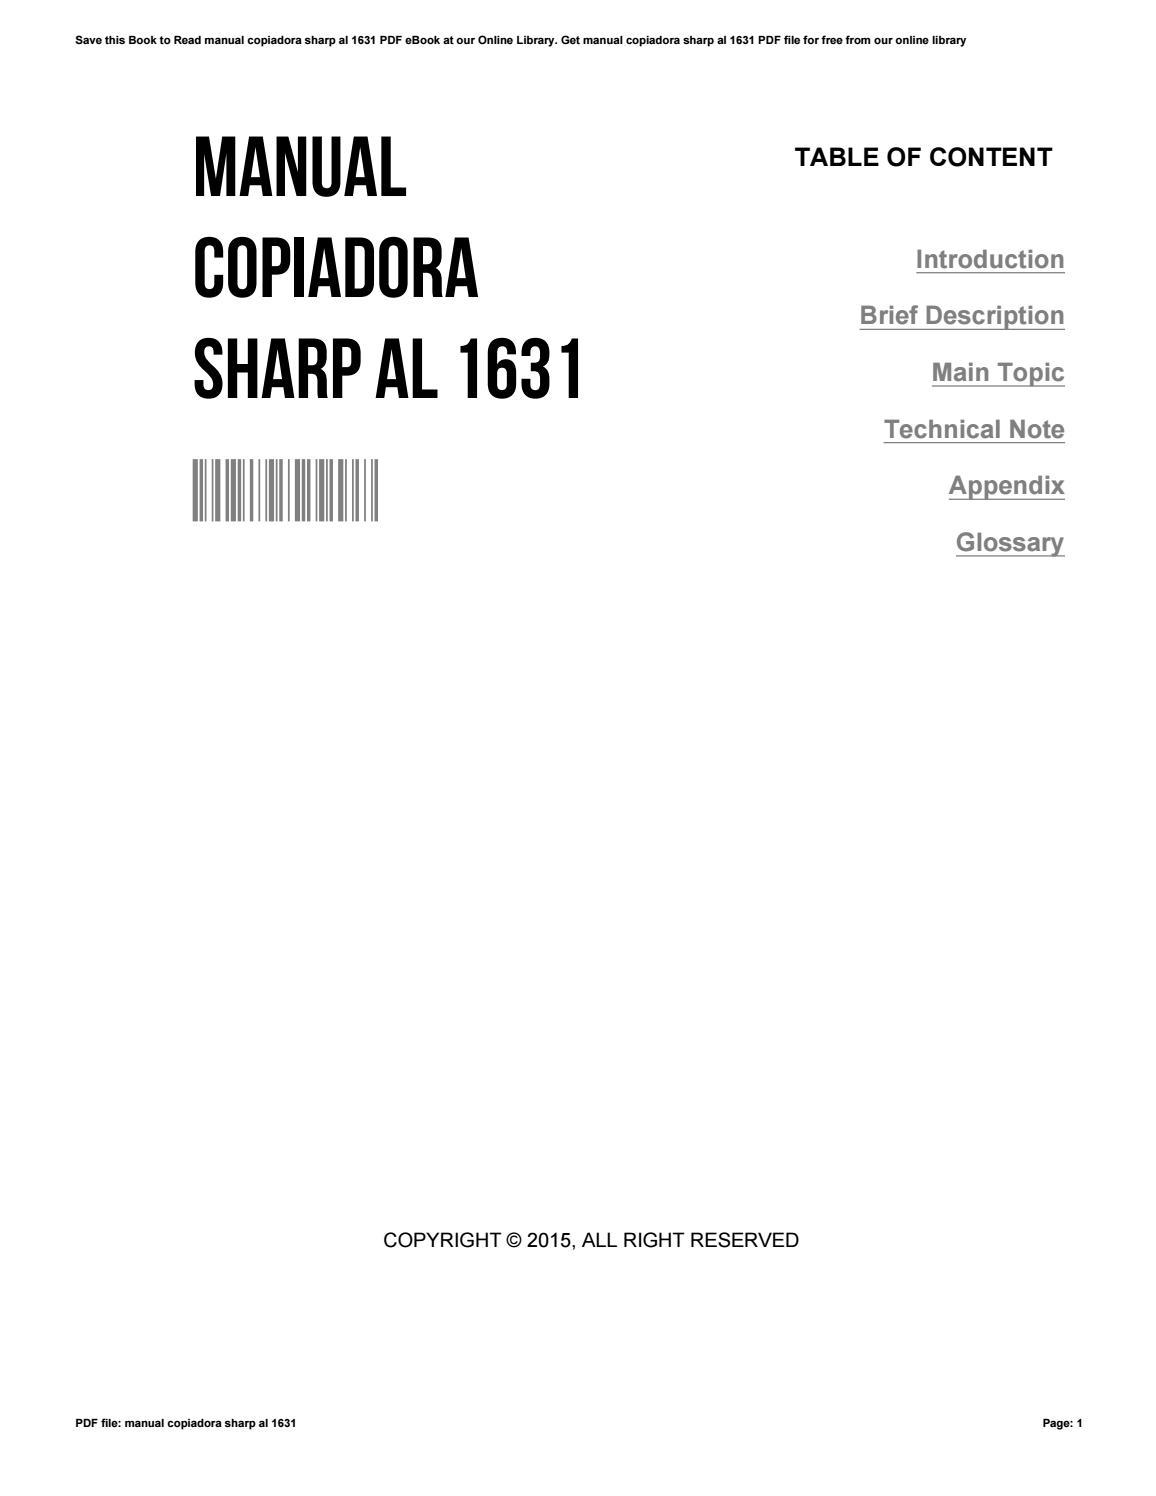 Manual copiadora sharp al 1631 by JamesBane4554 issuu